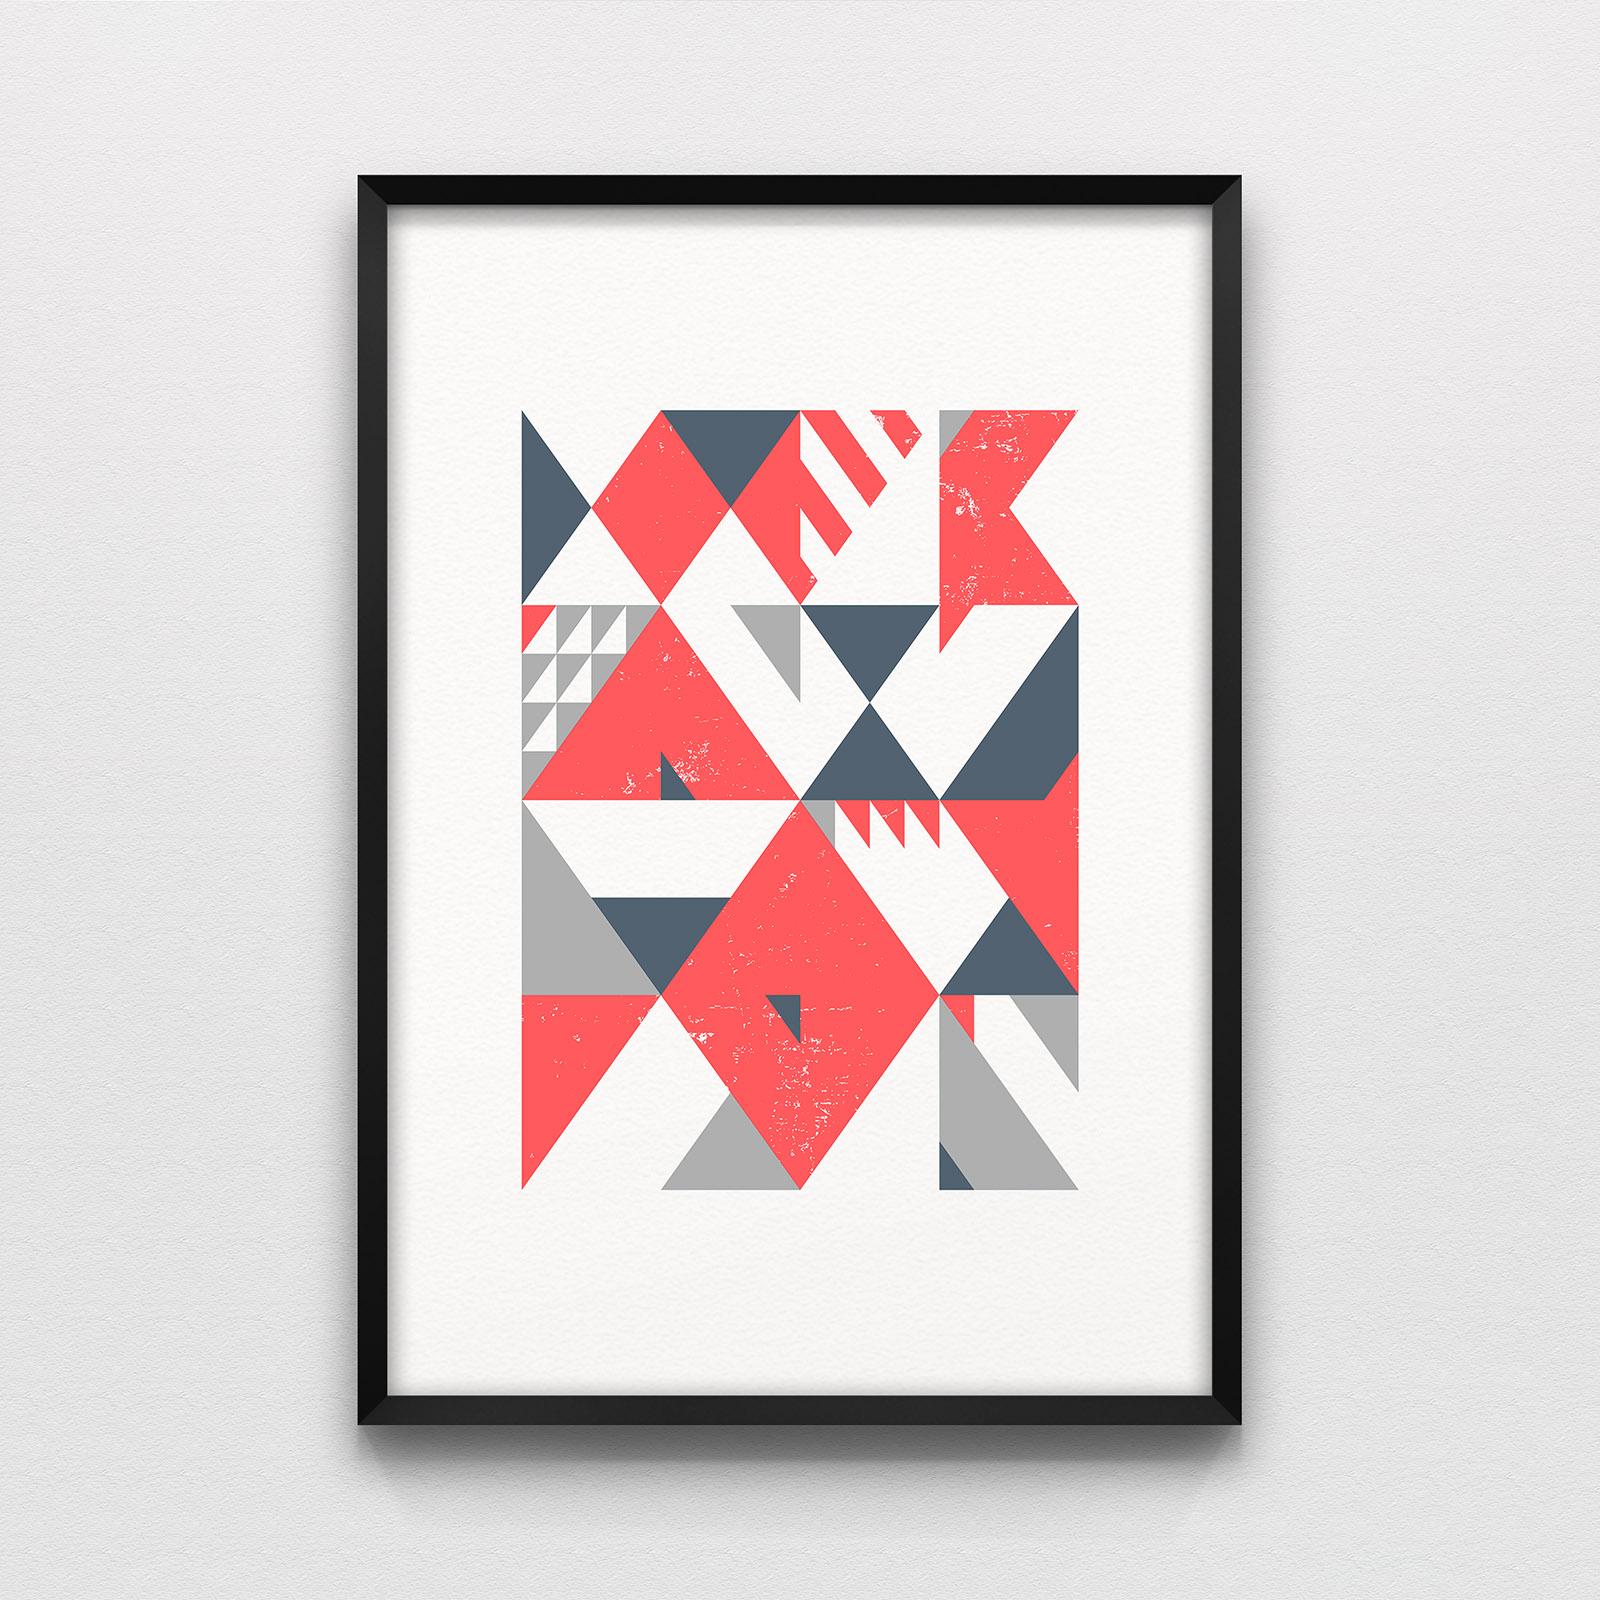 Algebra #1 (50 x 35 cm)